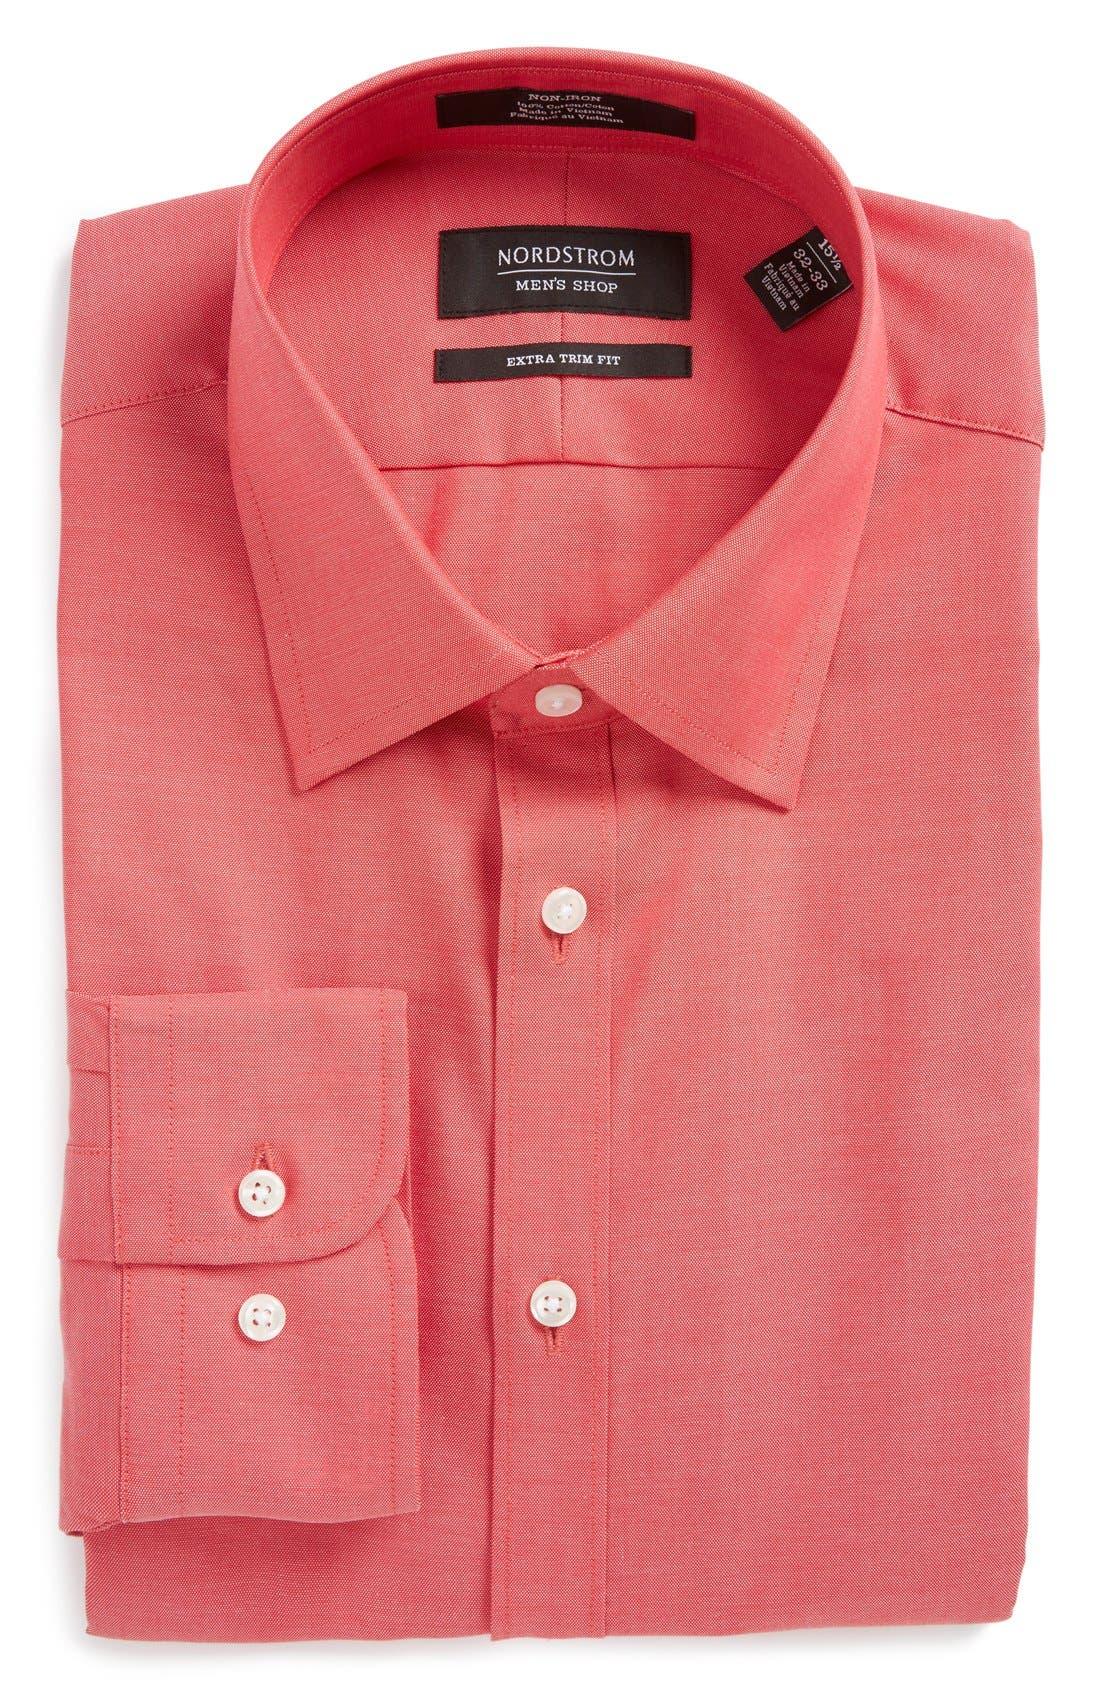 Alternate Image 1 Selected - Nordstrom Men's Shop Extra Trim Fit Non-Iron Solid Dress Shirt (Regular, Big & Tall)